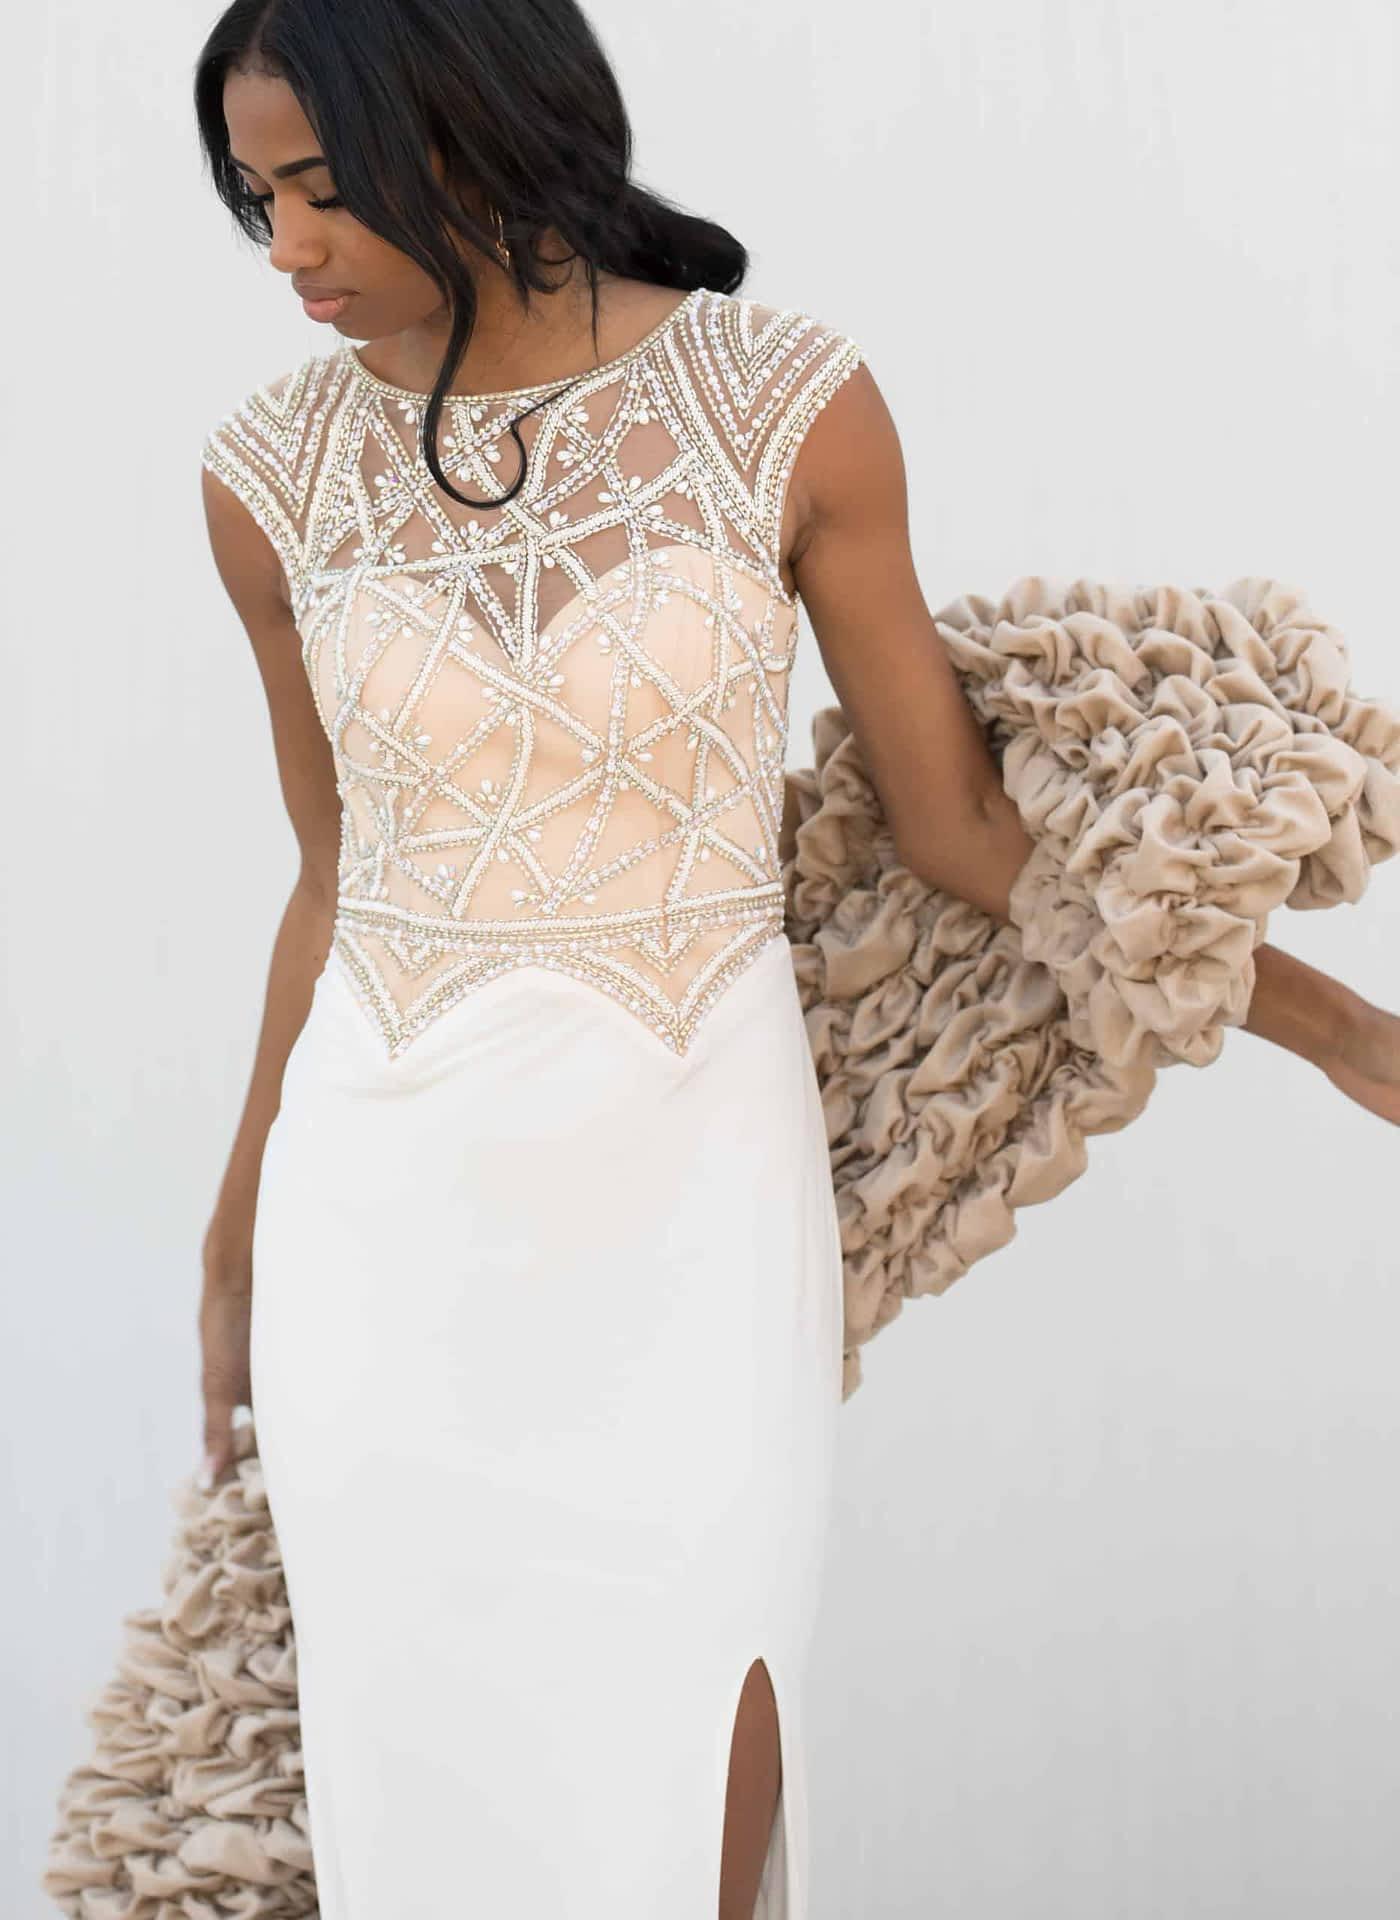 Wedding dress - Dress